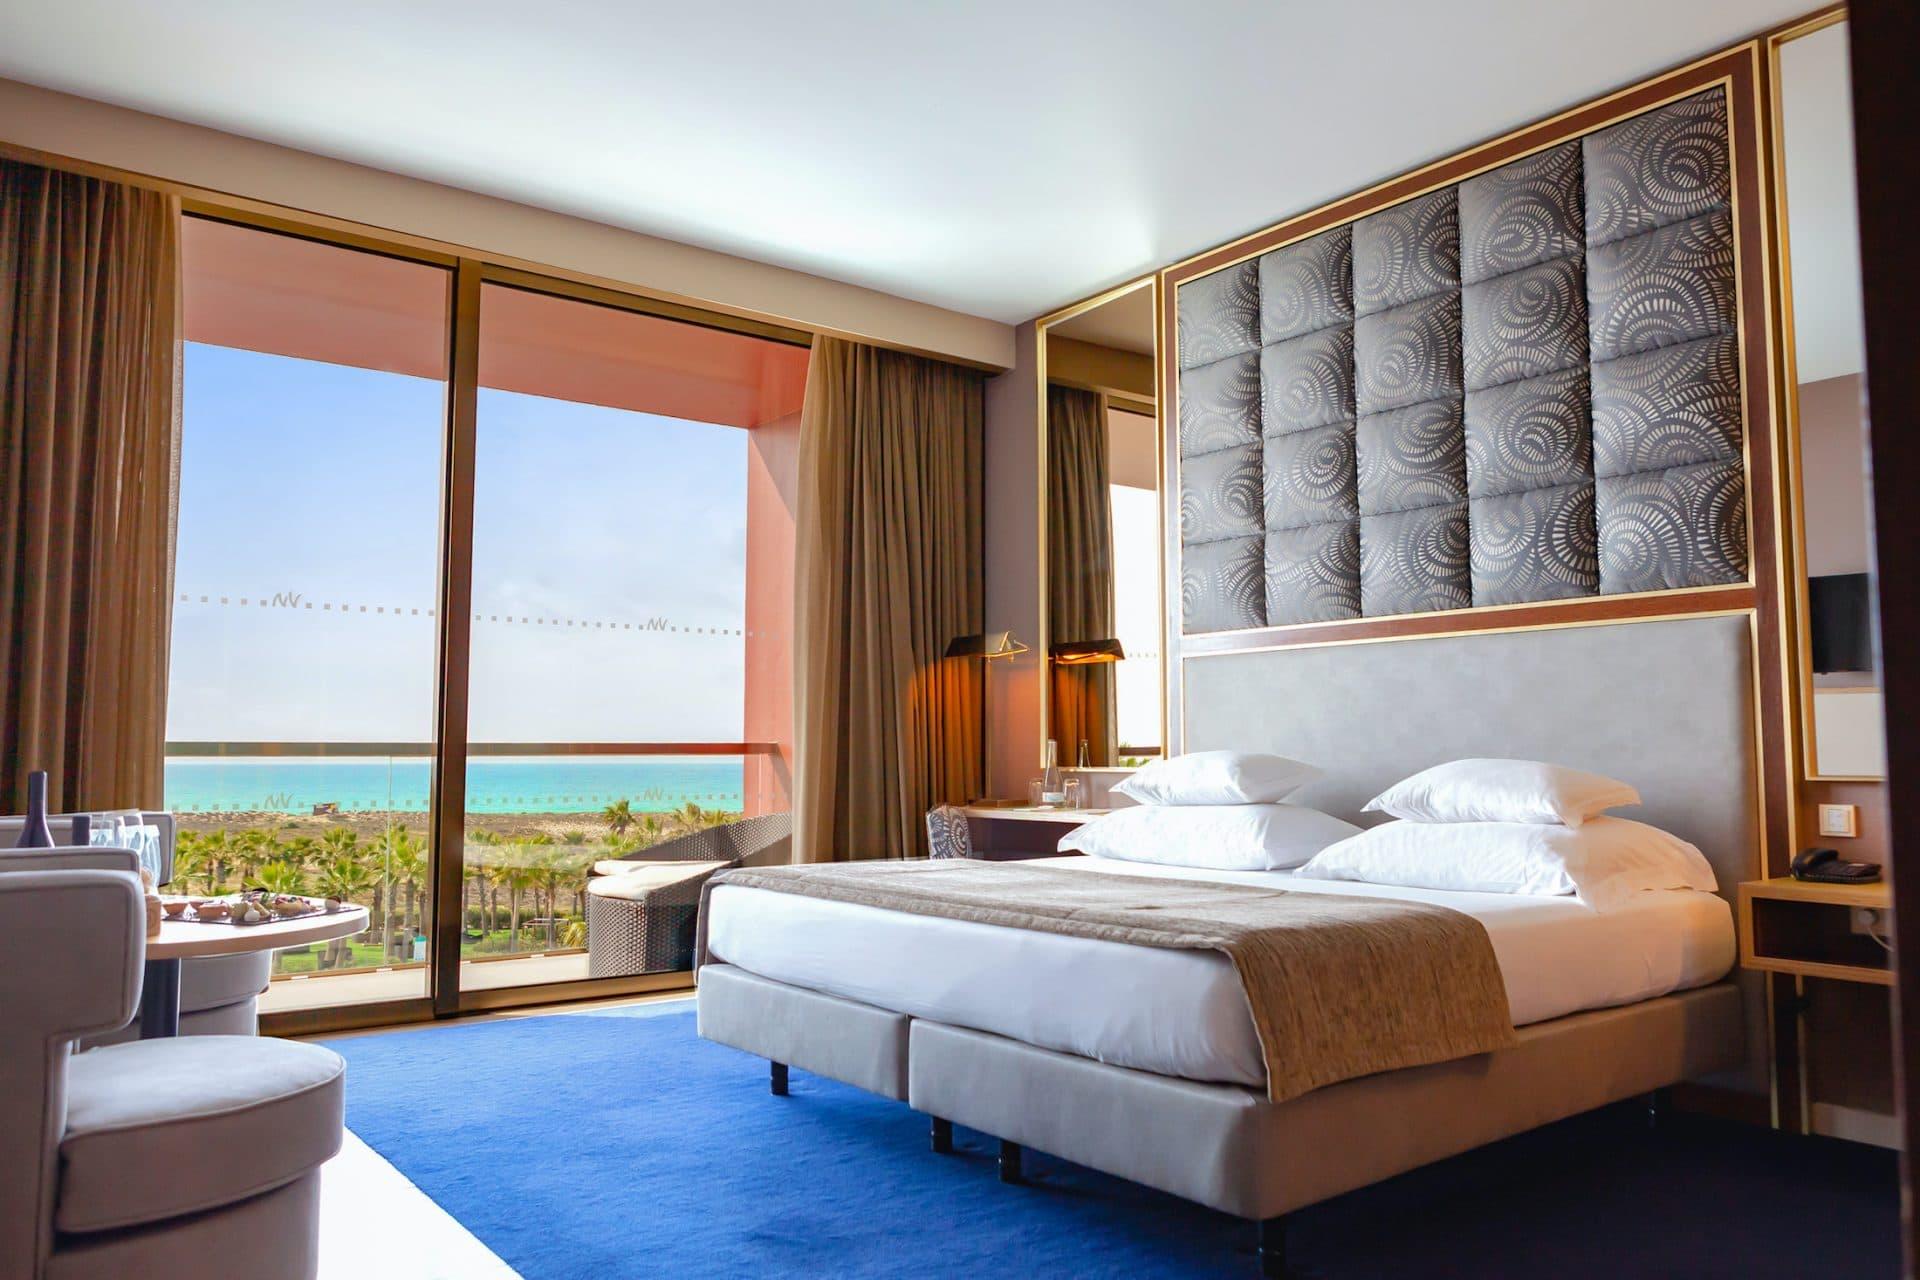 Premium-double-interior-vidamar-hotels-resorts-algarve